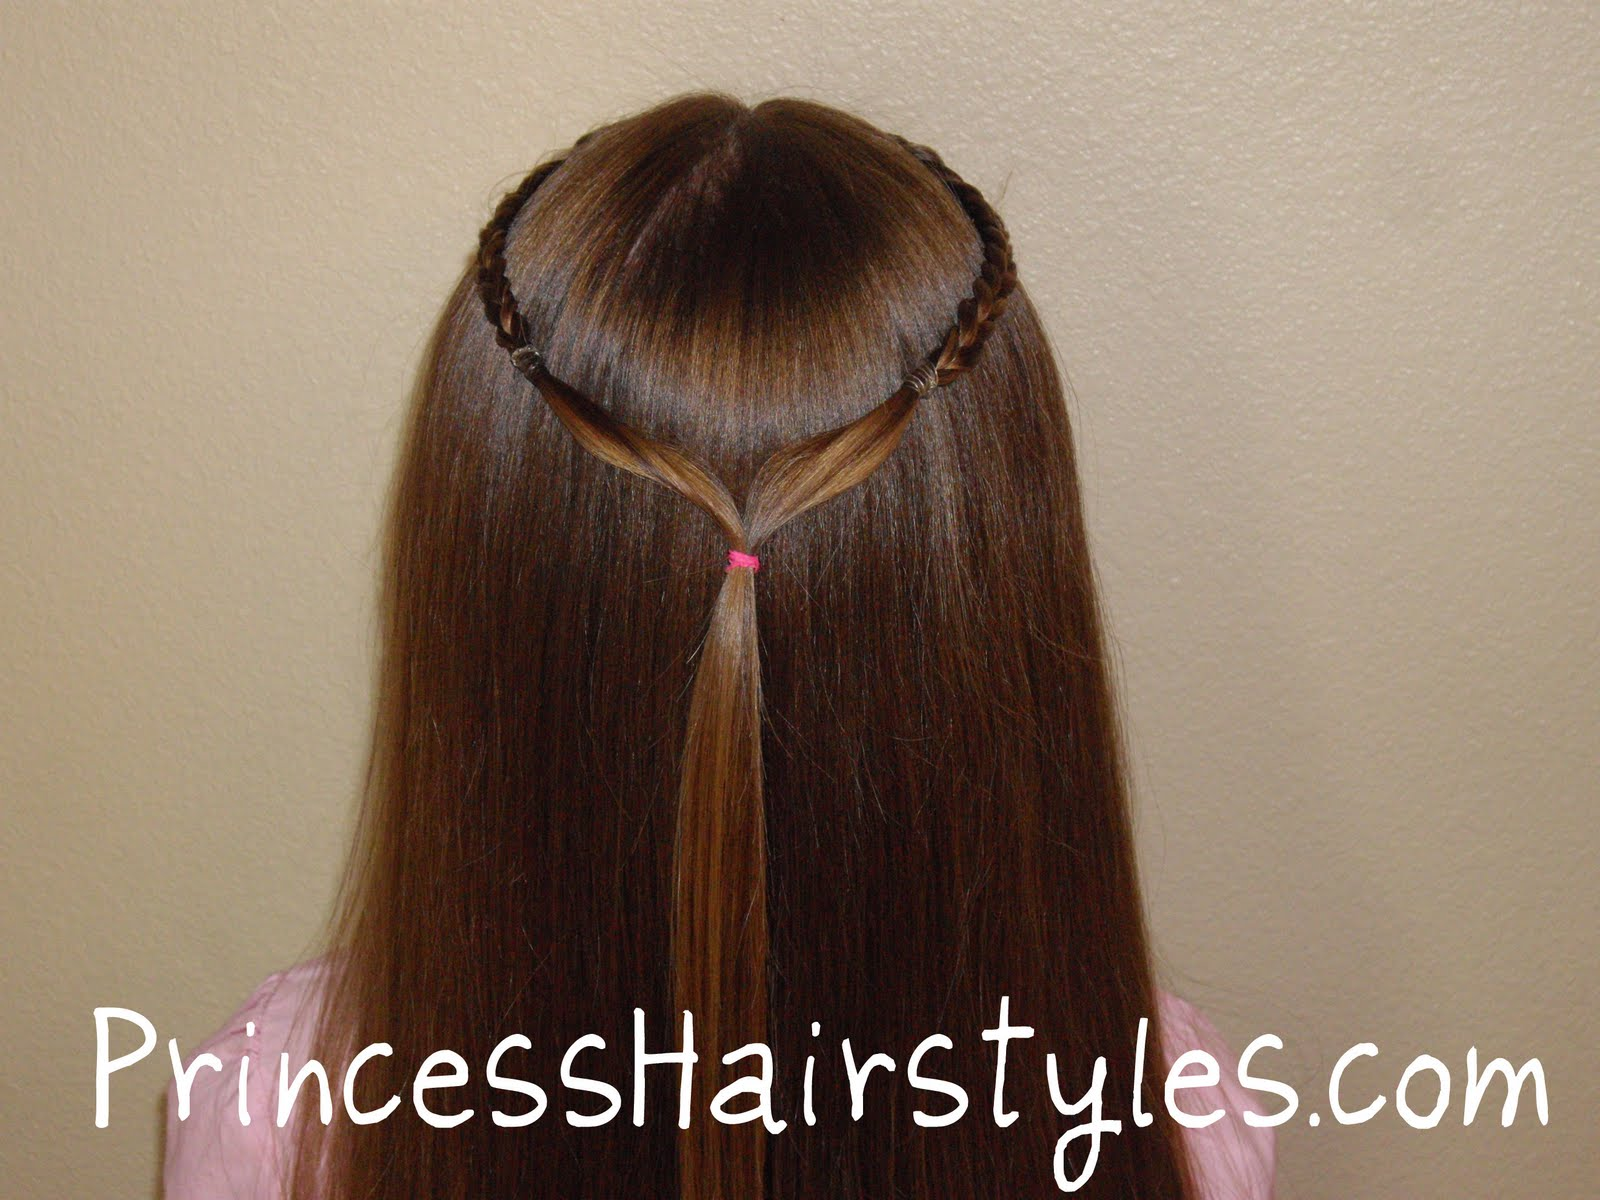 https://i2.wp.com/4.bp.blogspot.com/_p0Kt28QRU1I/THa_xVP6yQI/AAAAAAAAGfc/Ou2NUIt0R-w/s1600/Princess+Braids.jpg